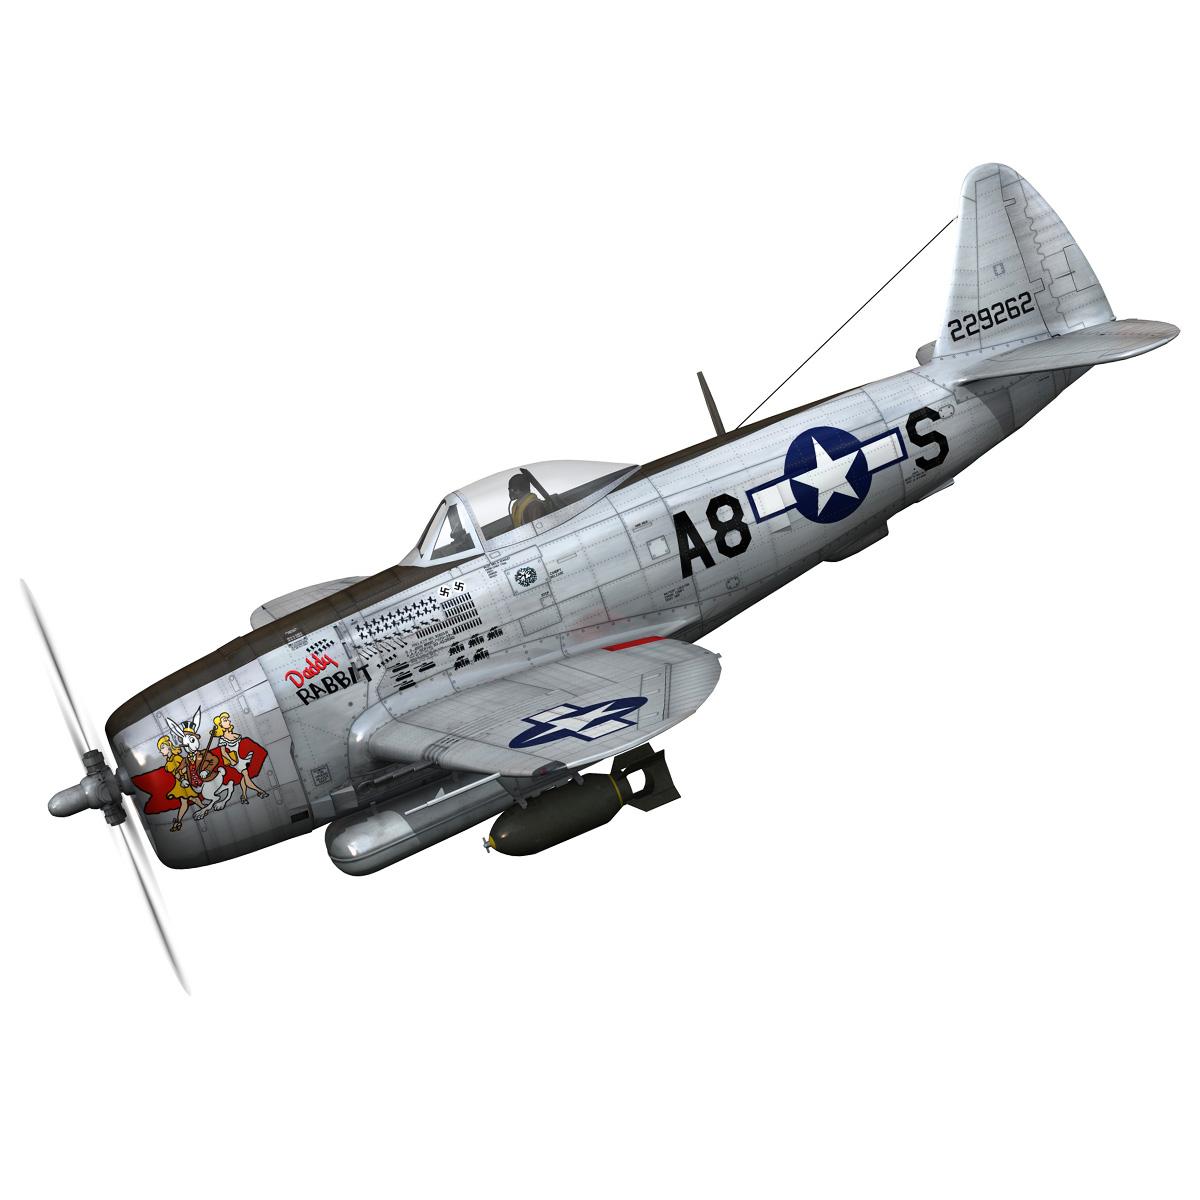 republic p-47 thunderbolt – daddy rabbit 3d model fbx c4d lwo obj 272689